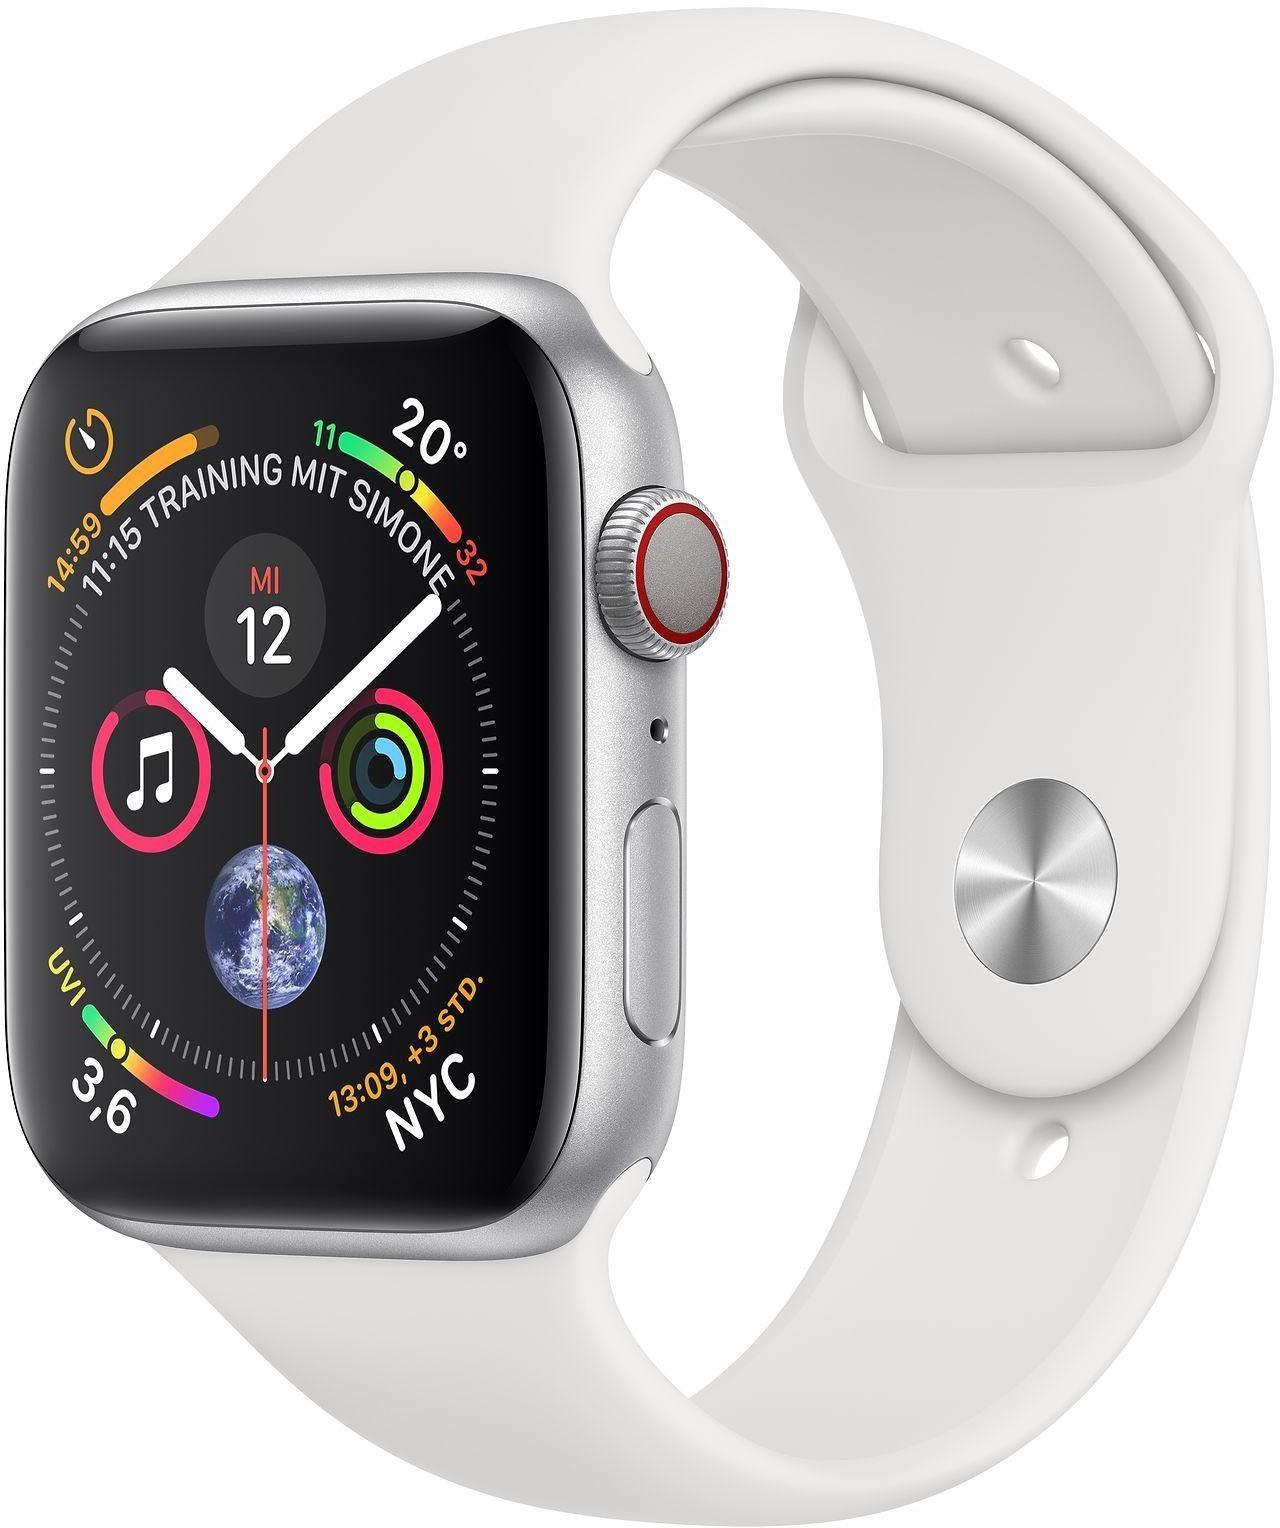 Series 4 GPS + Cellular, Aluminiumgehäuse mit Sportarmband 44mm Watch (watchOS 5)